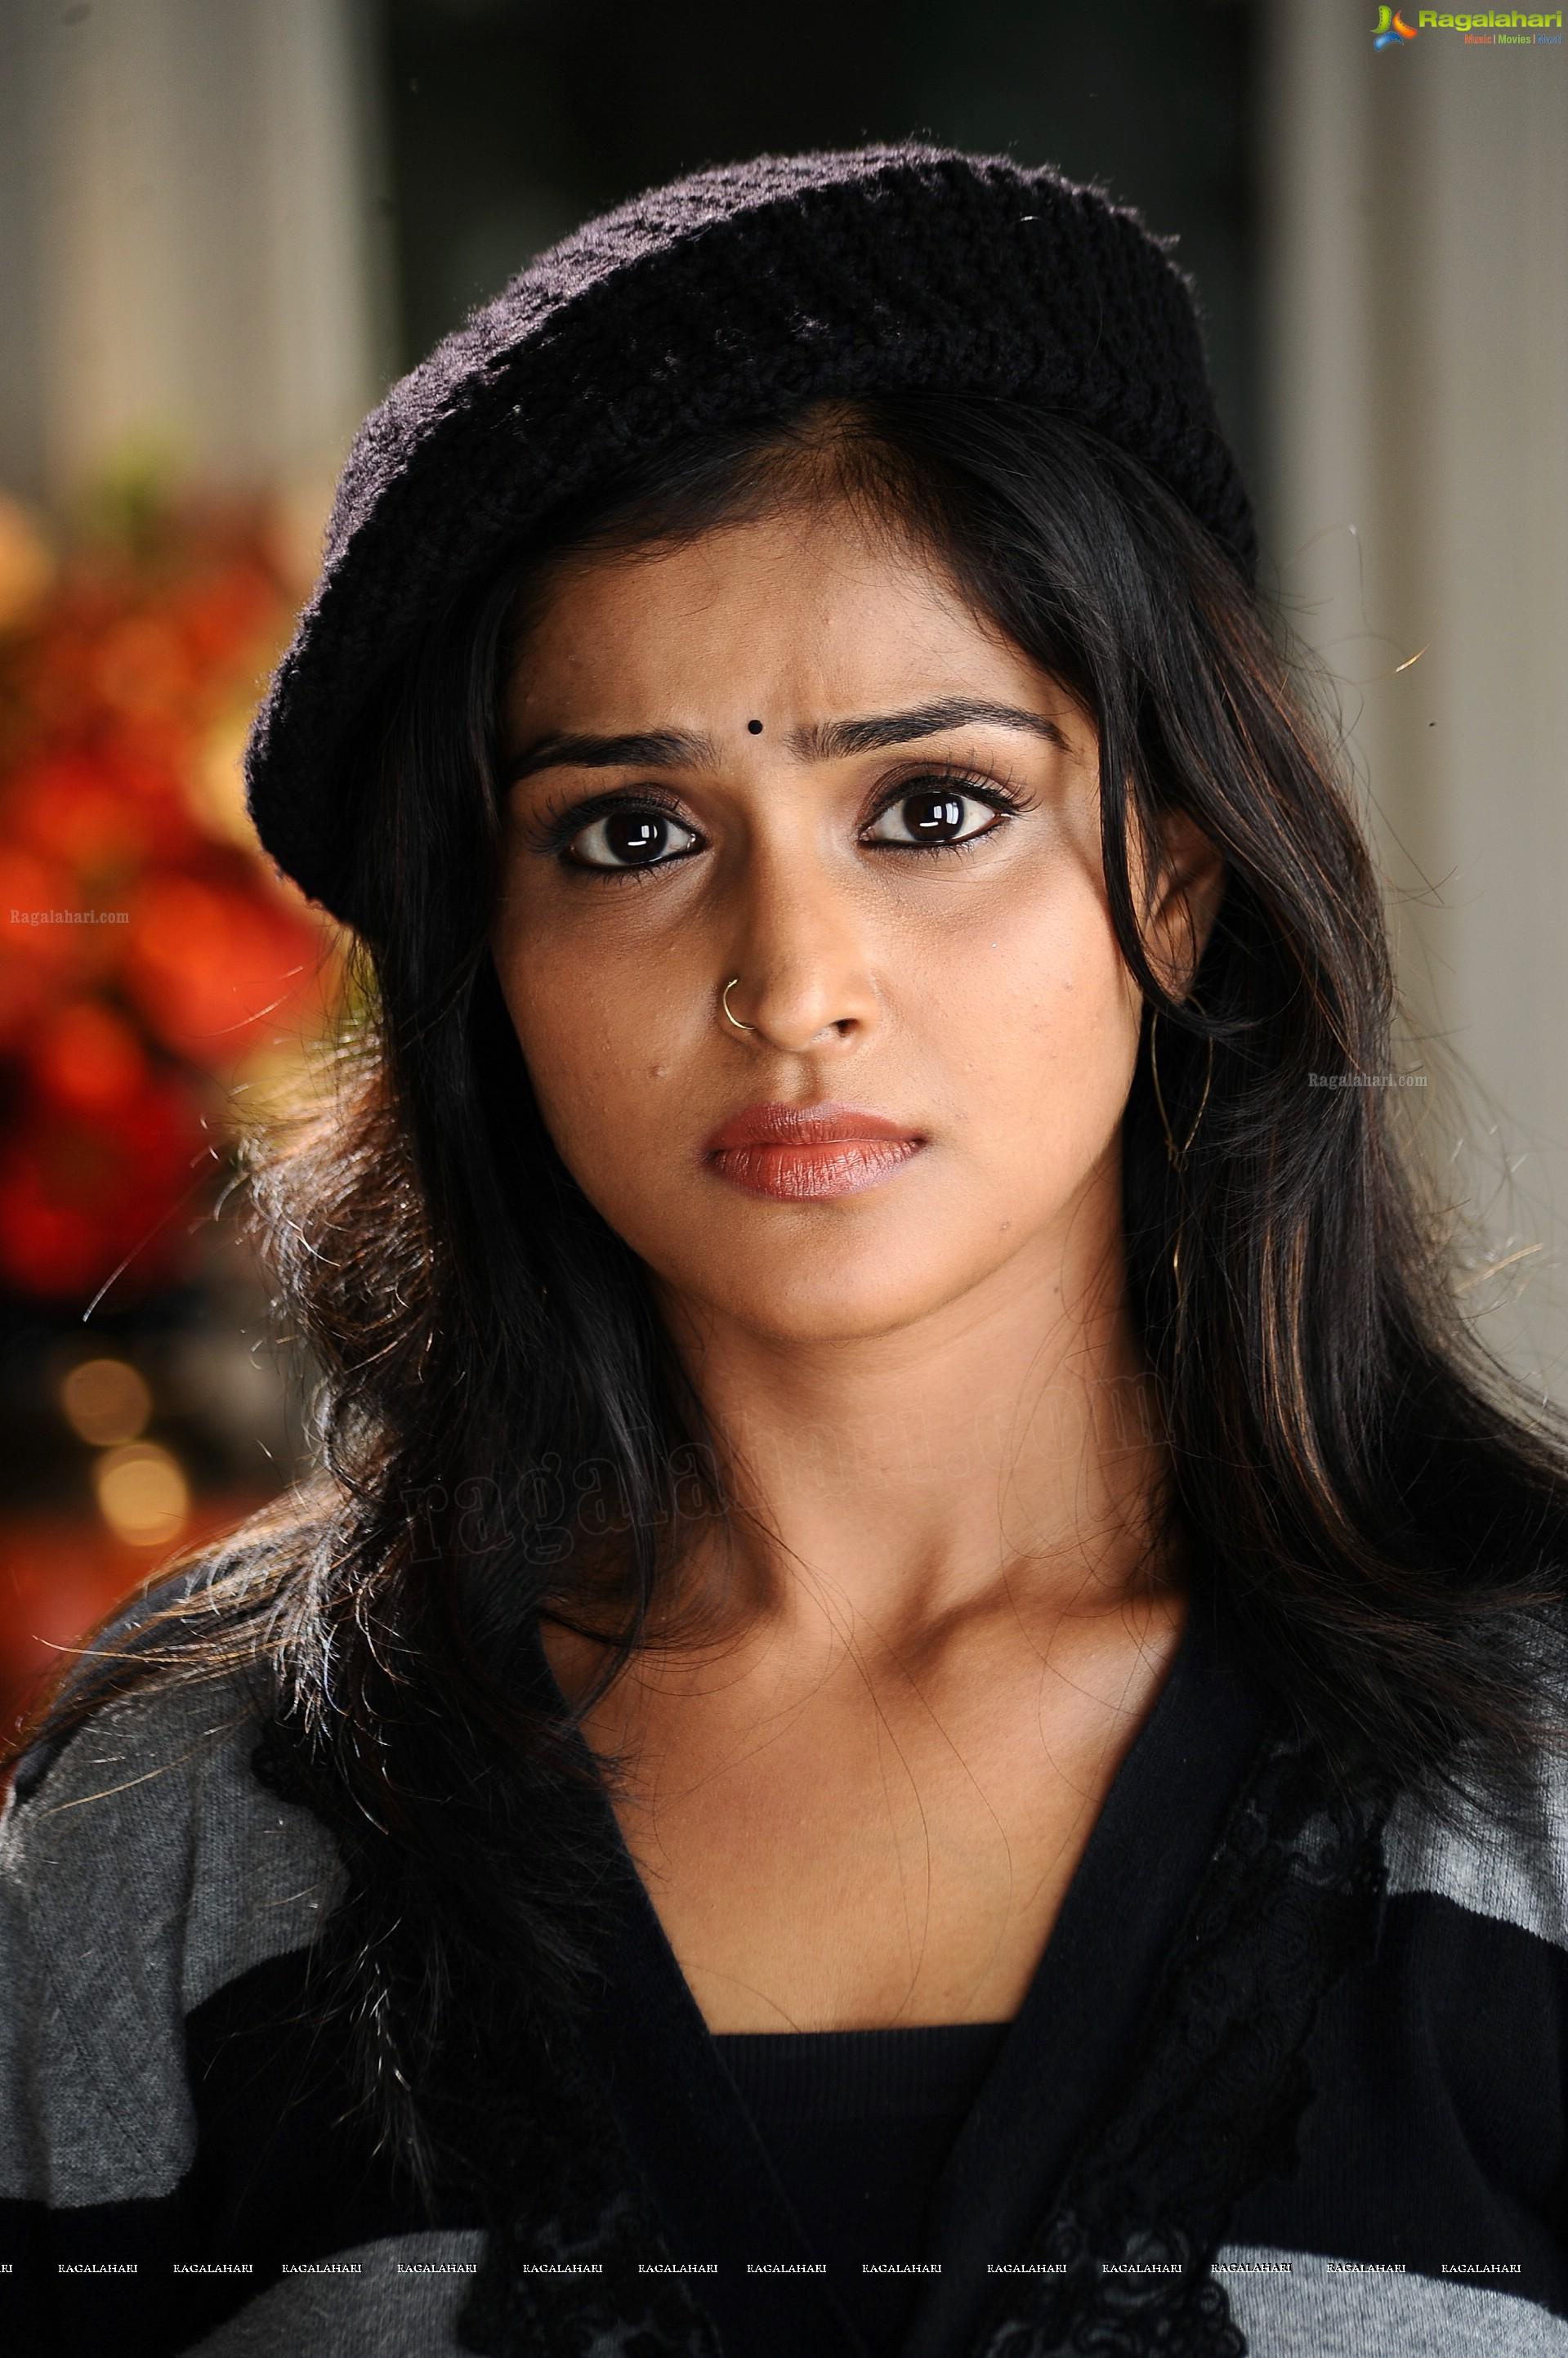 remya nambeesan (hd) image 54 | telugu actress photo gallery,images